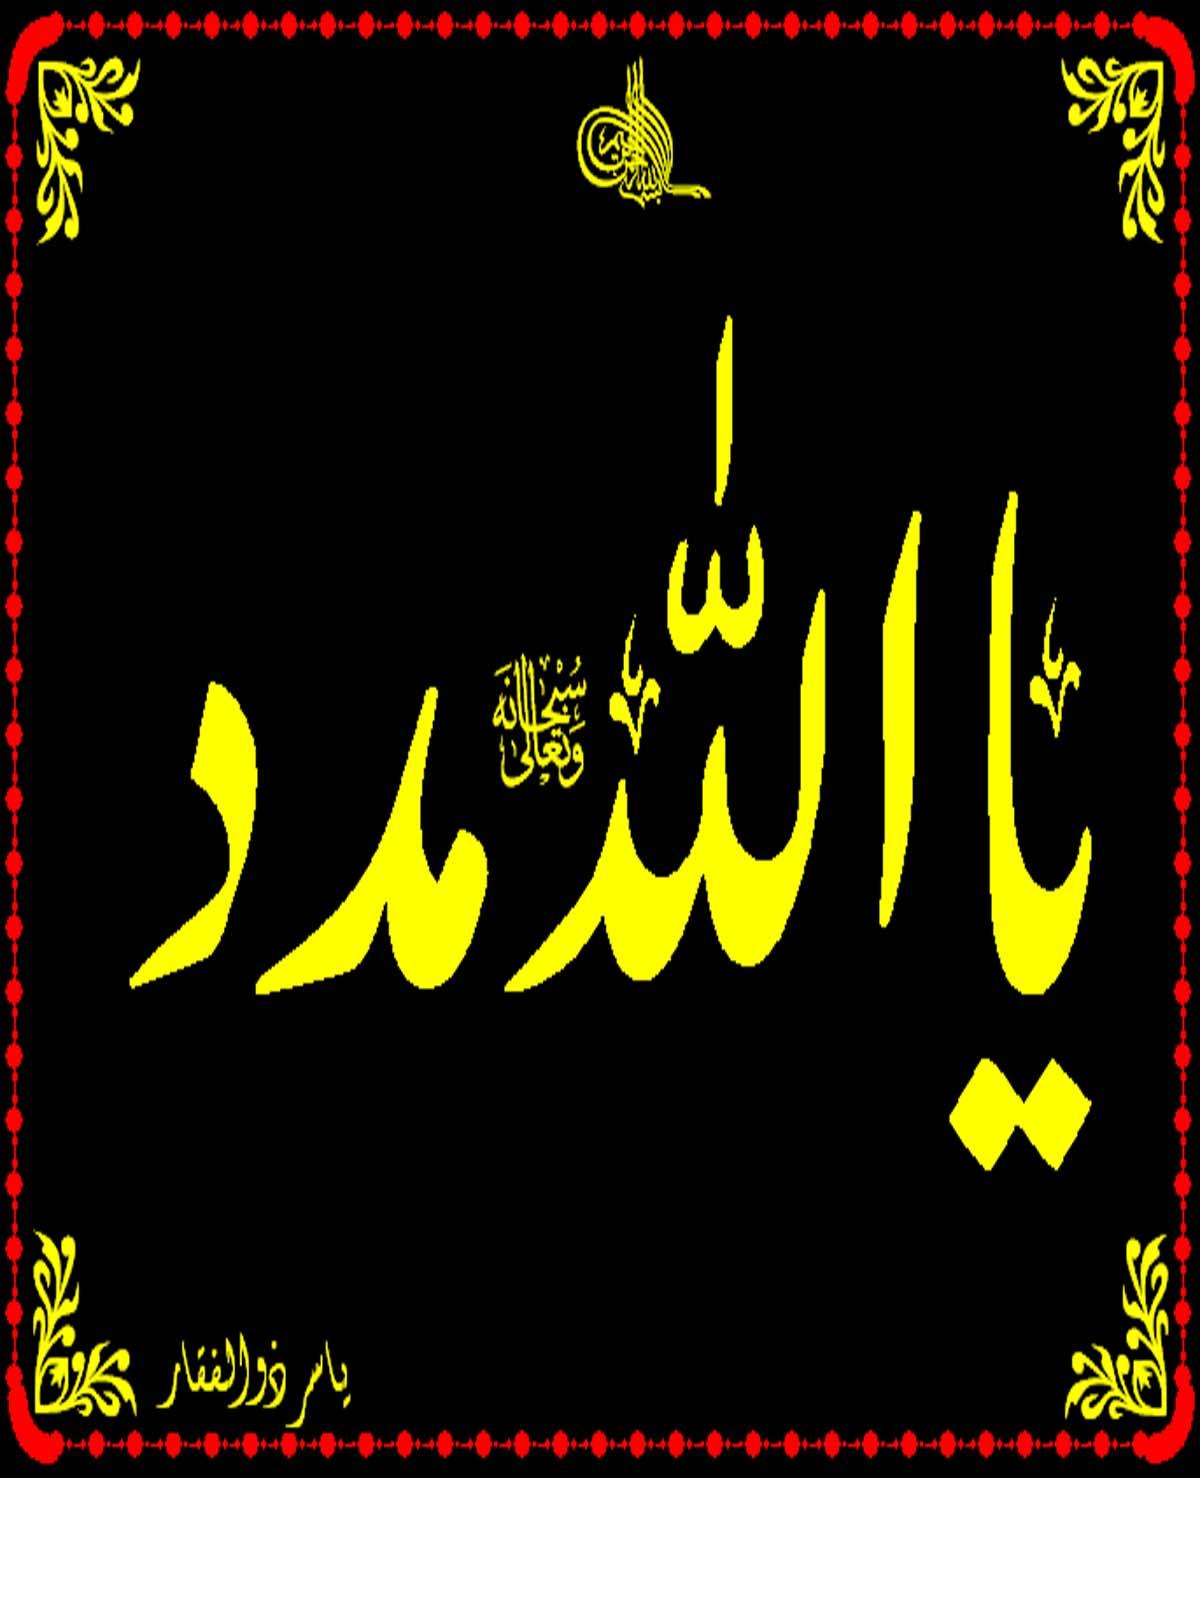 ya allah wallpapers islamic wallpapers